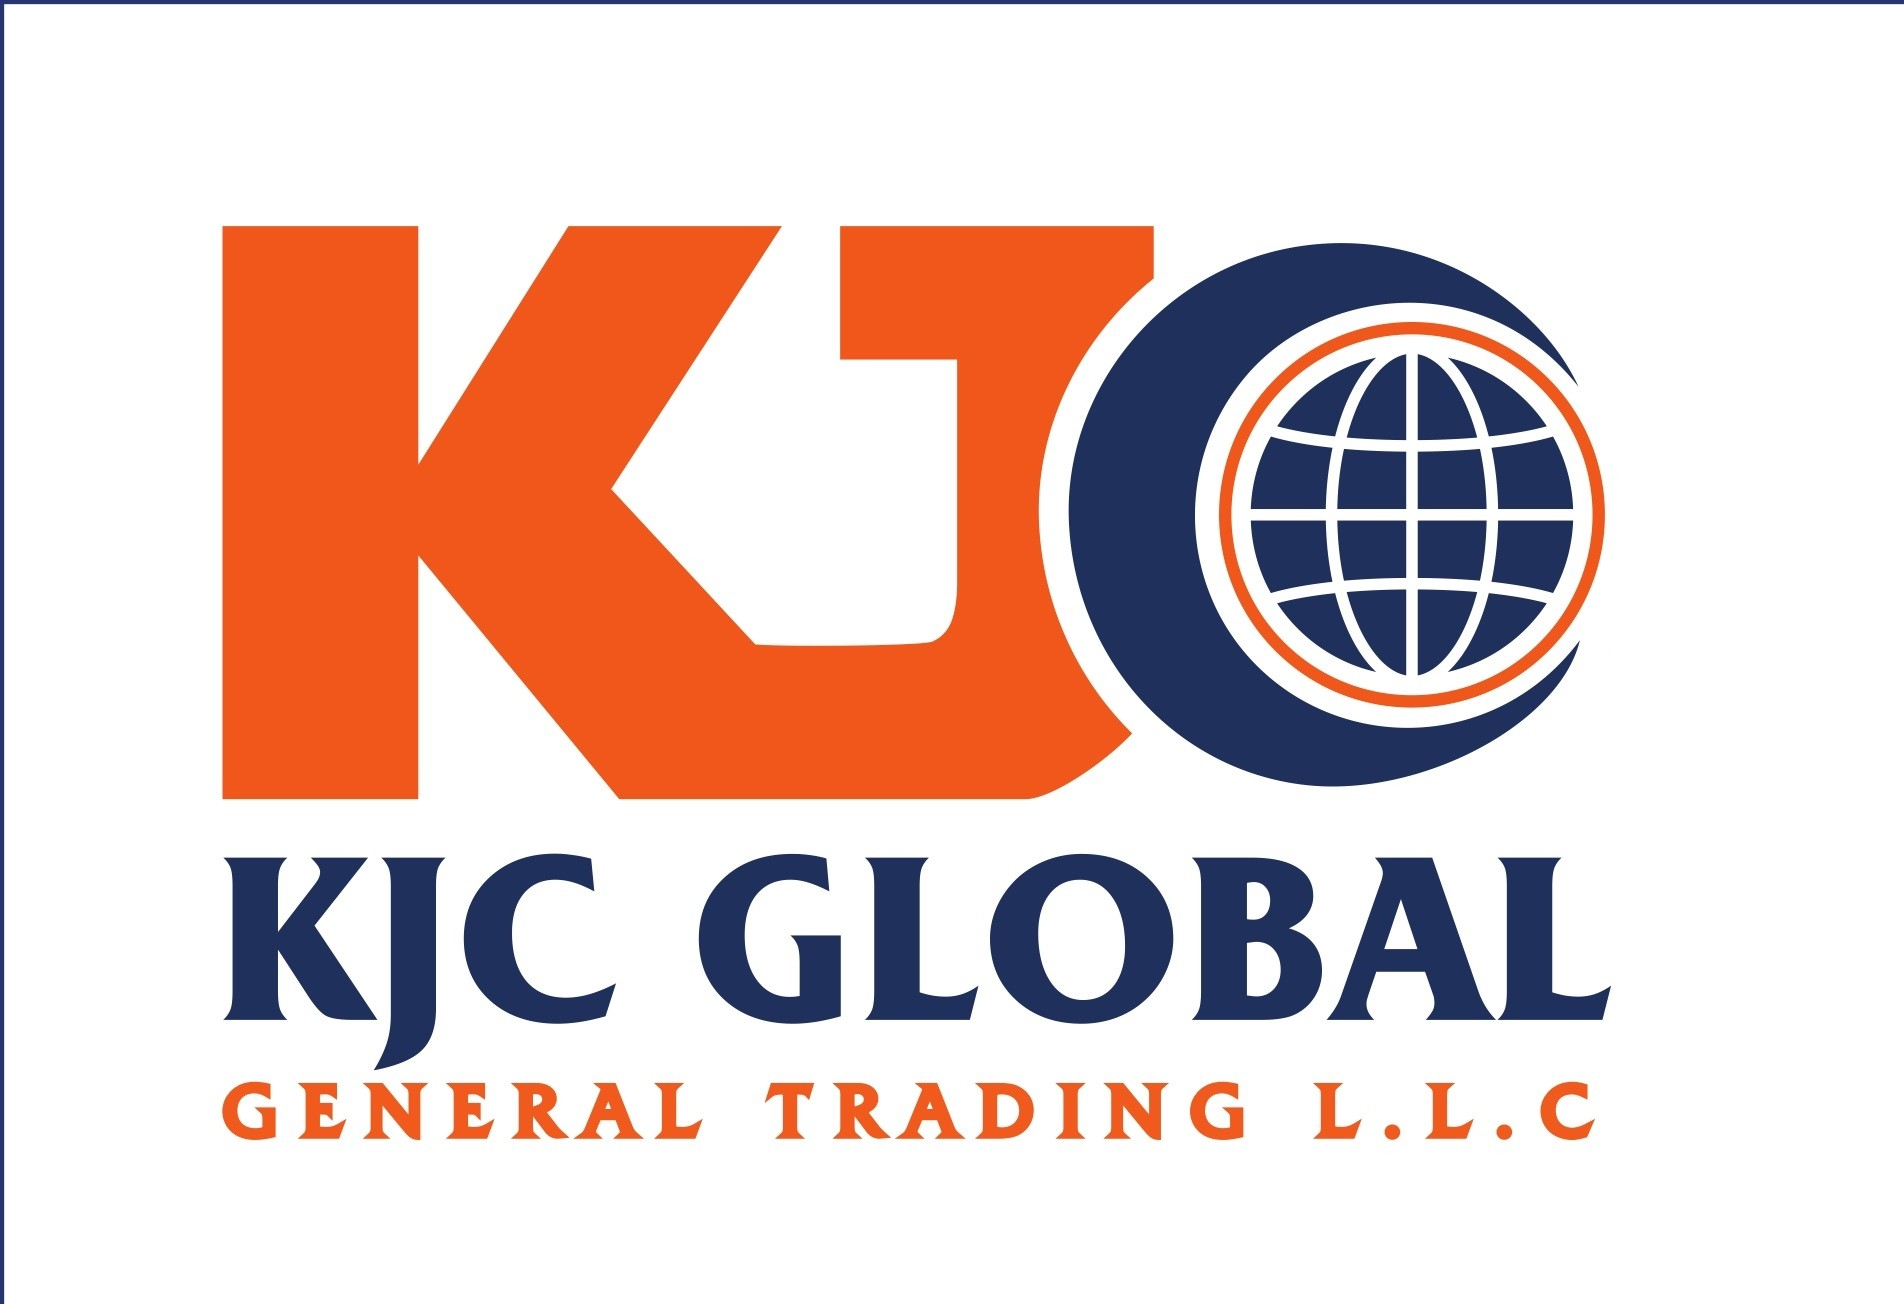 KJC Global General Trading LLC | LinkedIn